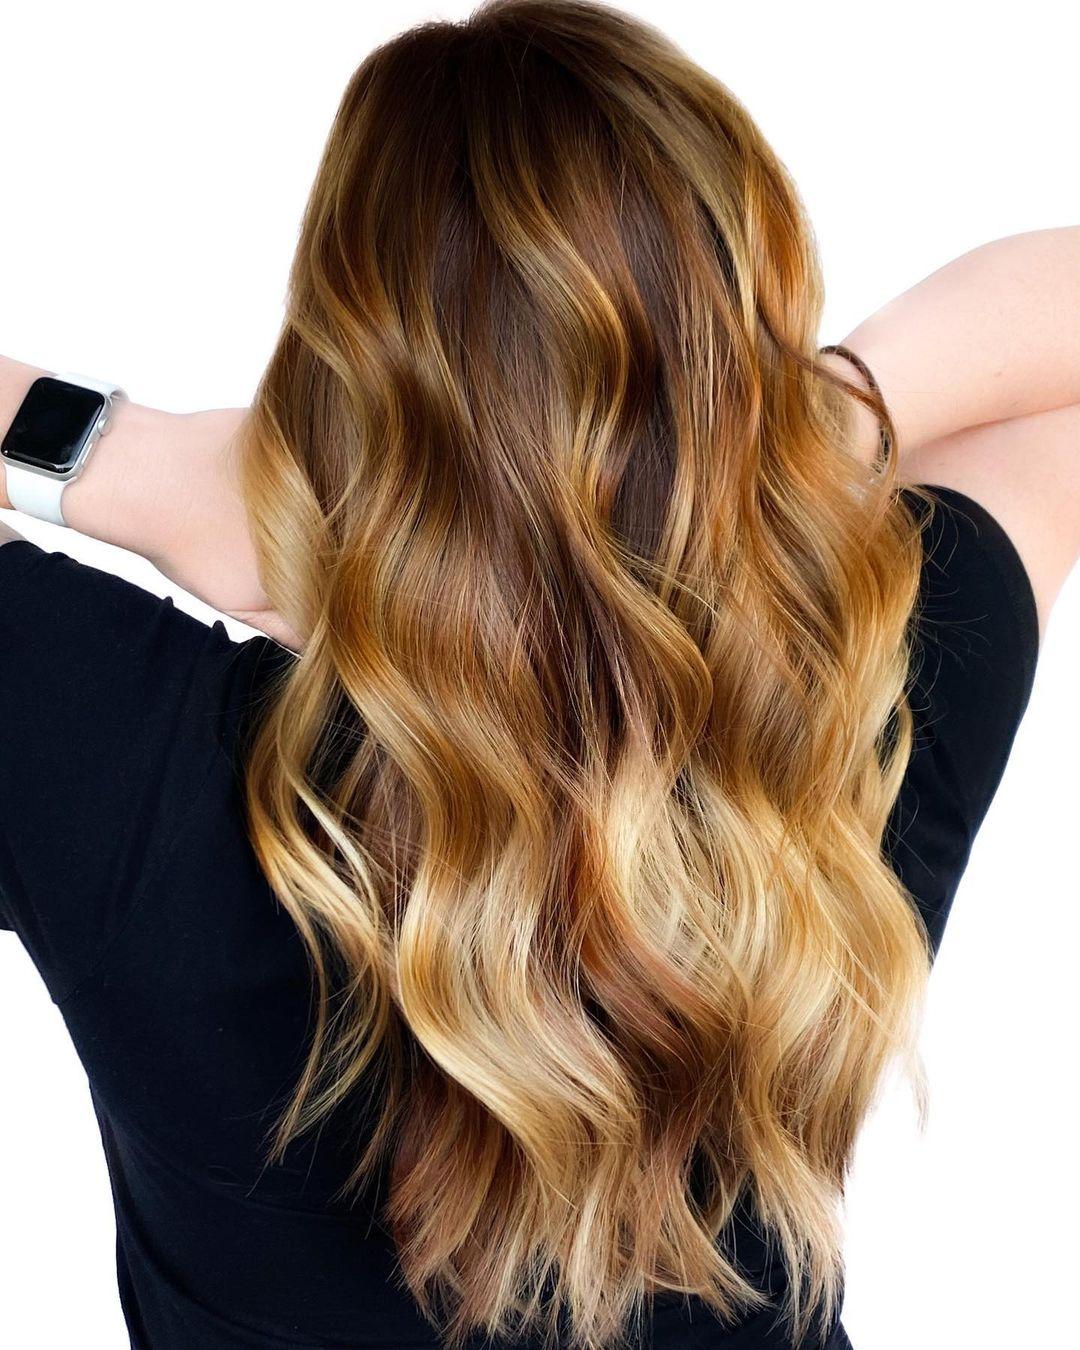 Long Honey Blonde Balayage Hair with Waves